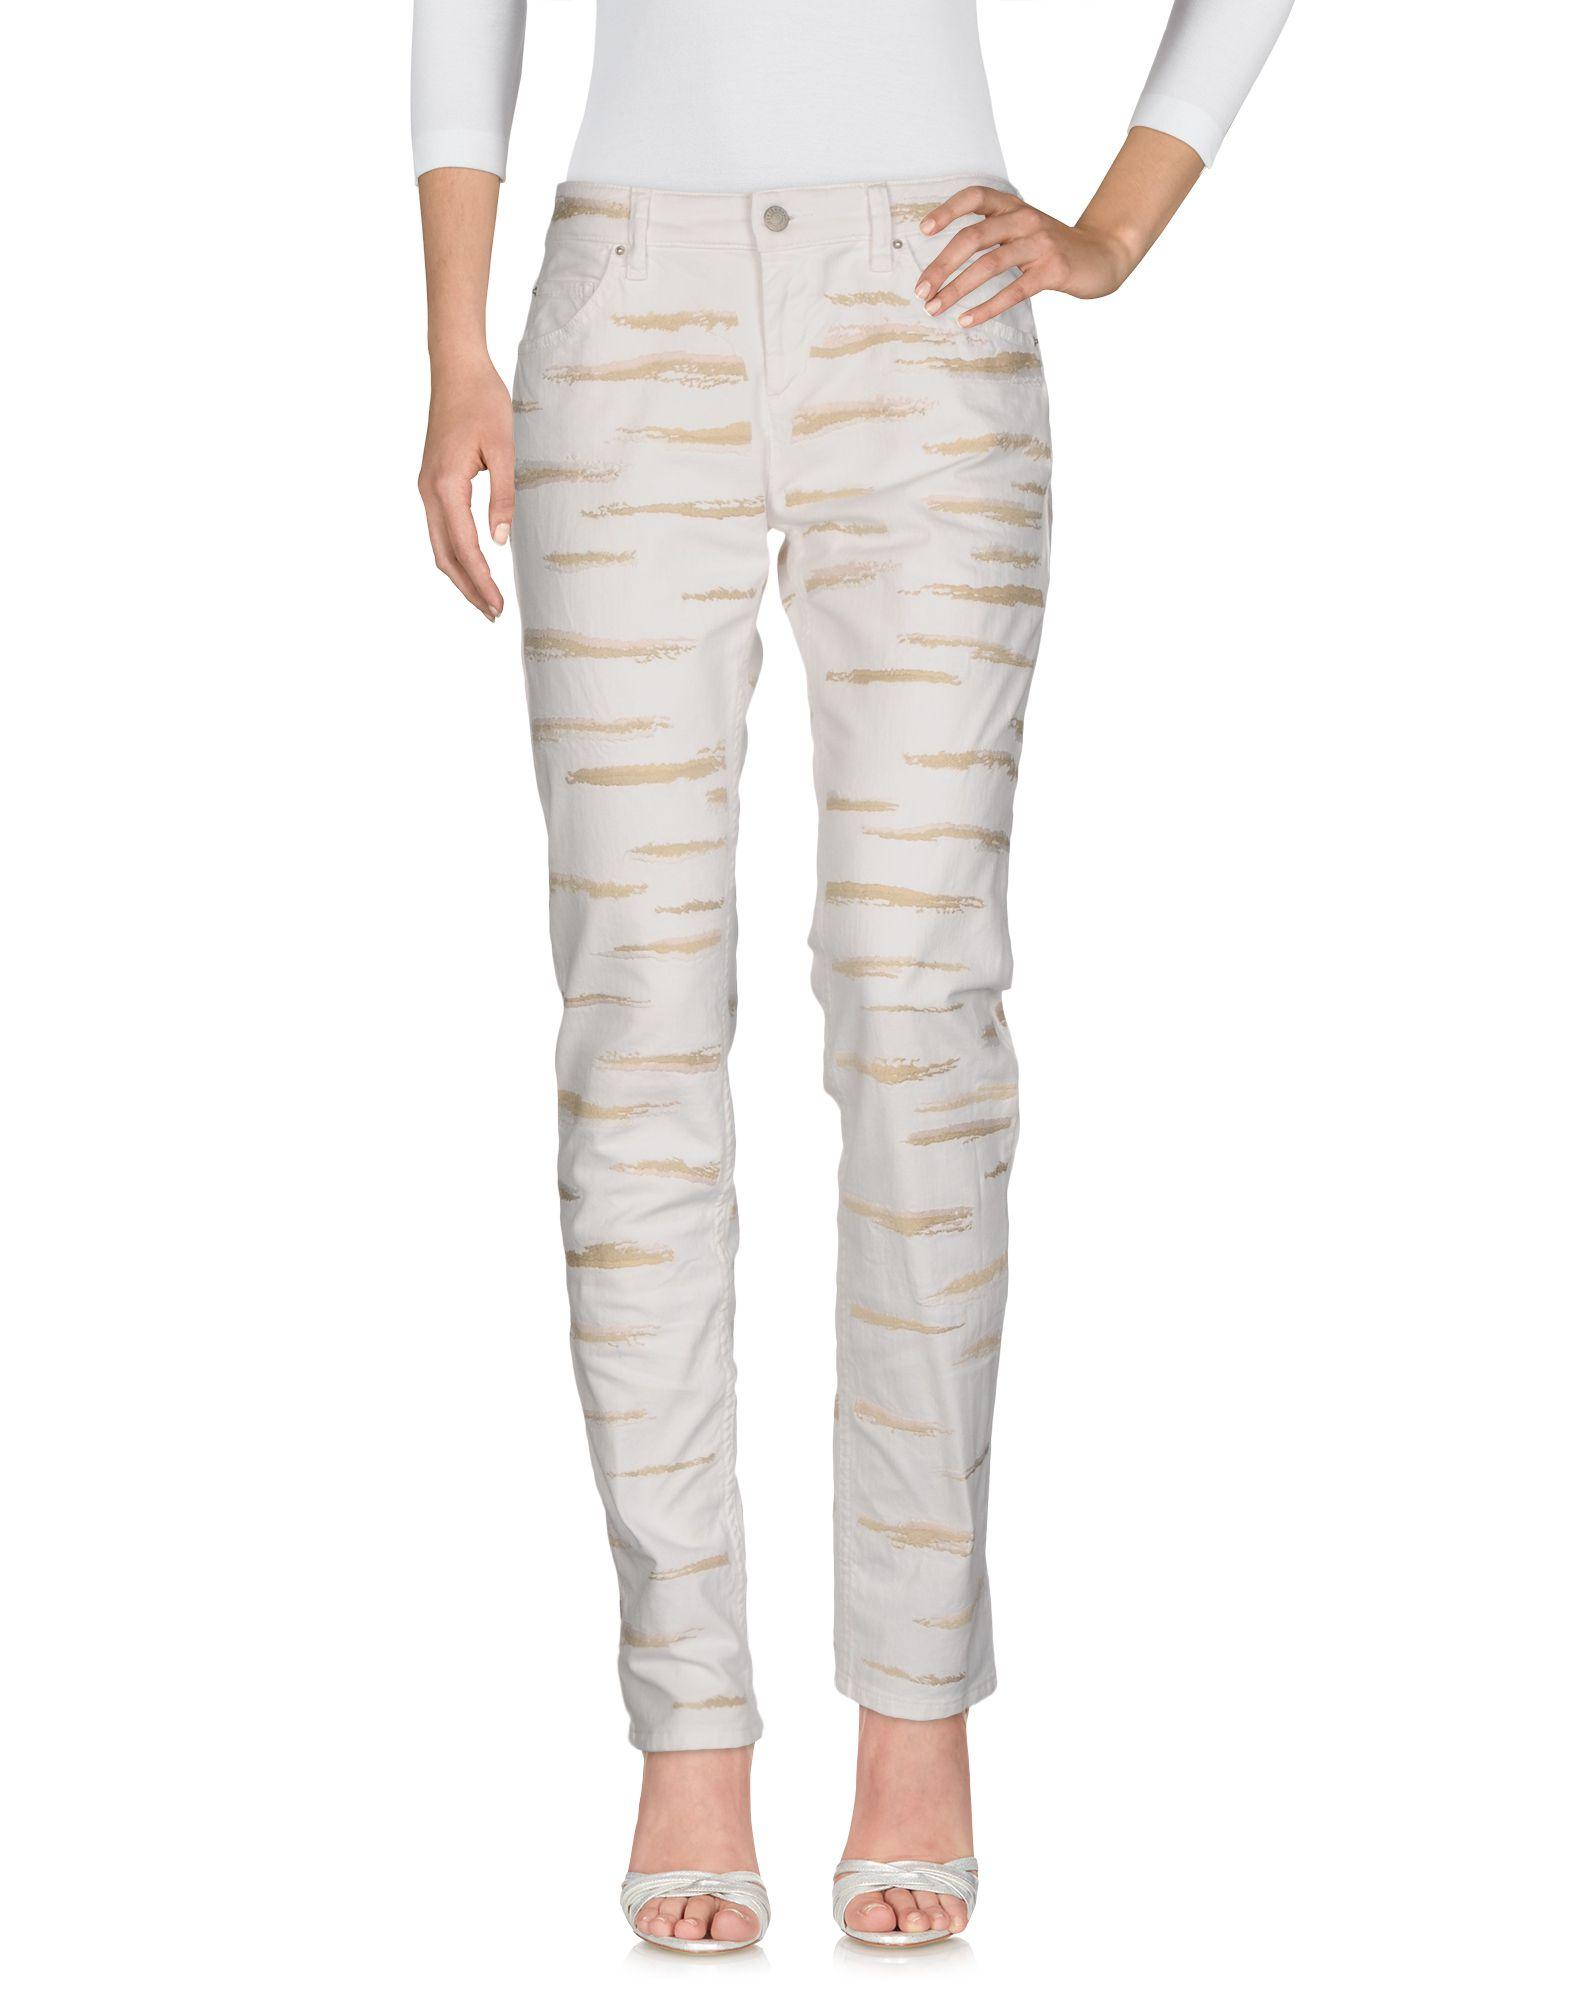 Pantaloni Jeans Isabel Marant Donna - Acquista online su ffZ9J